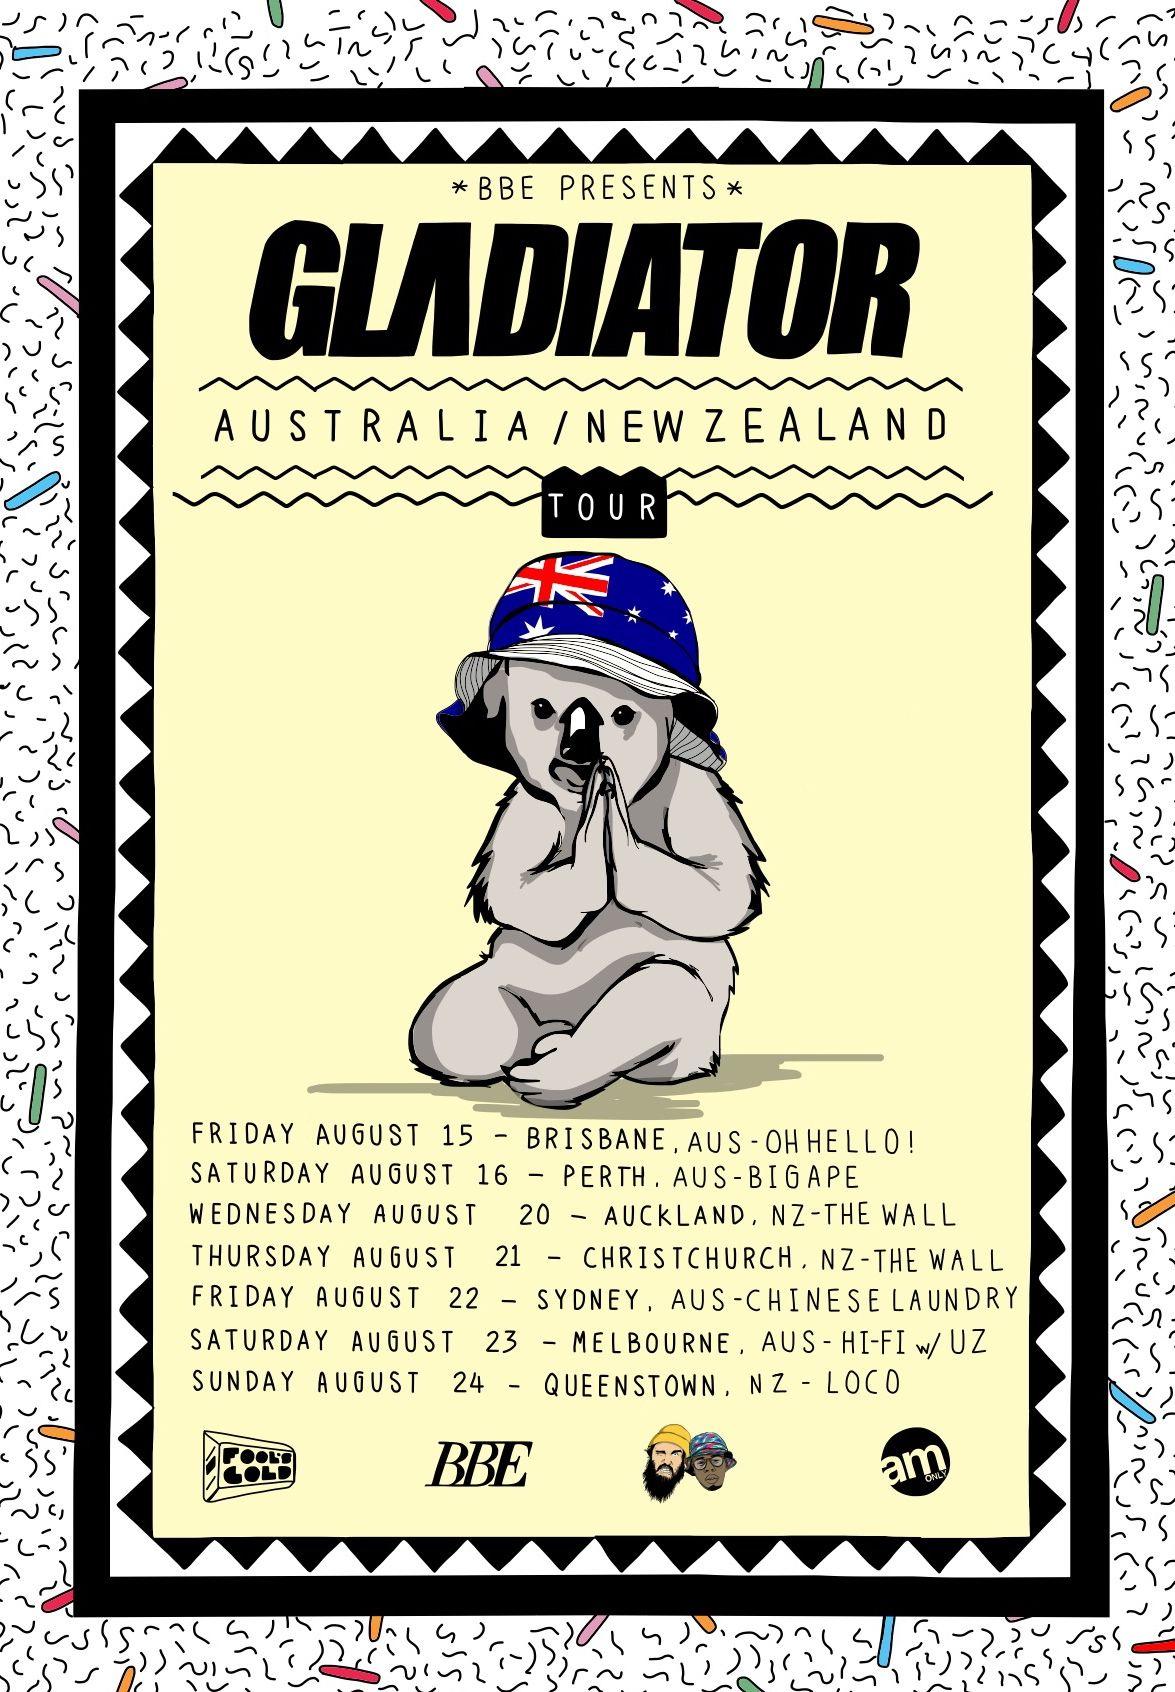 BBE presents GLΛDIATOR: Australia / New Zealand tour poster by dEMOx ...